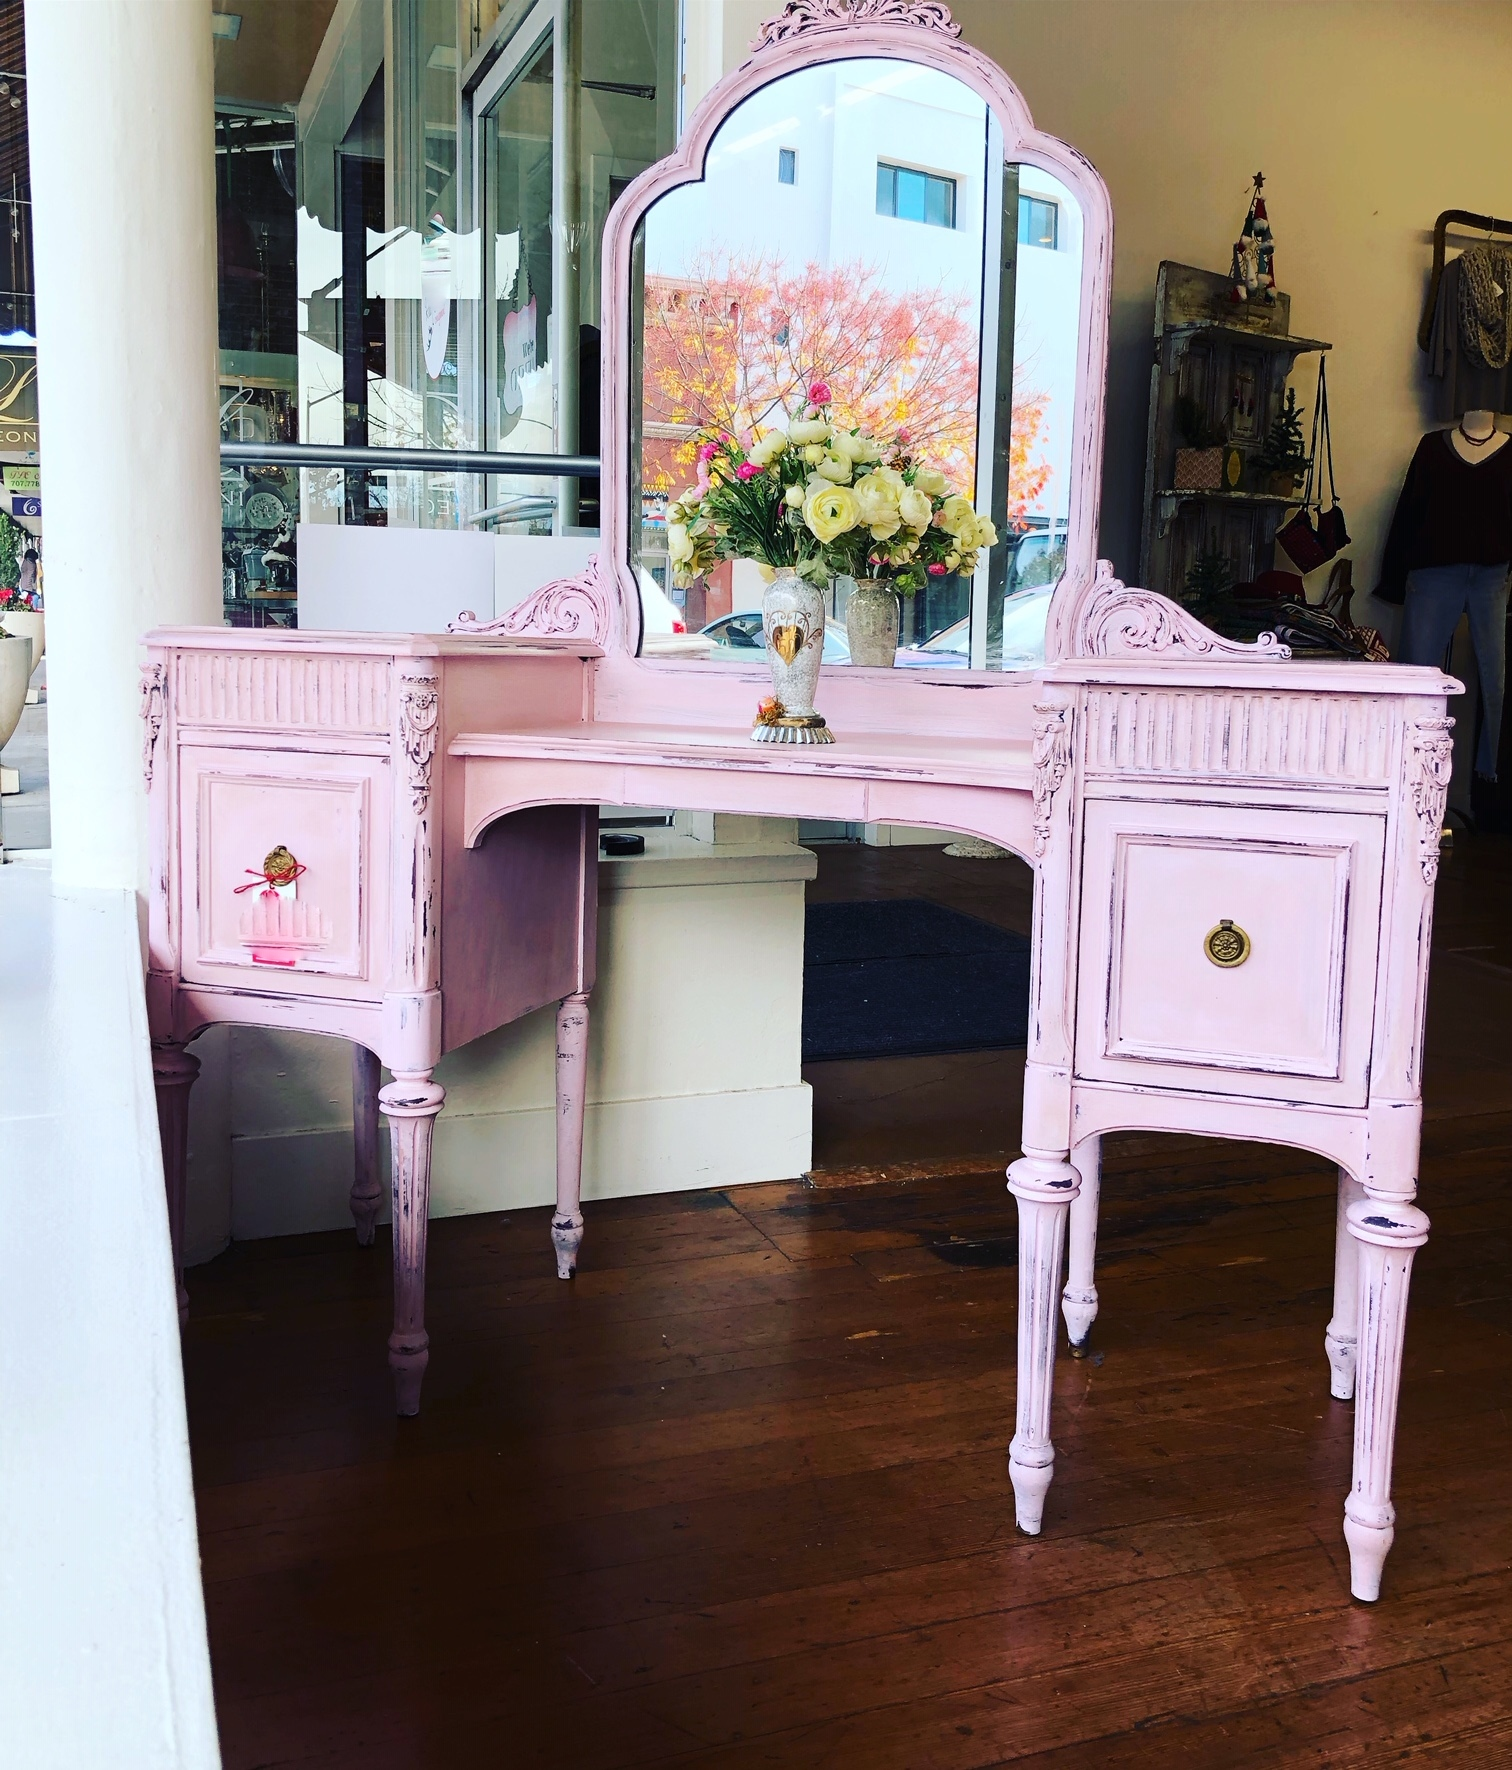 Millennial Pink Vanity Dressing Table - $395